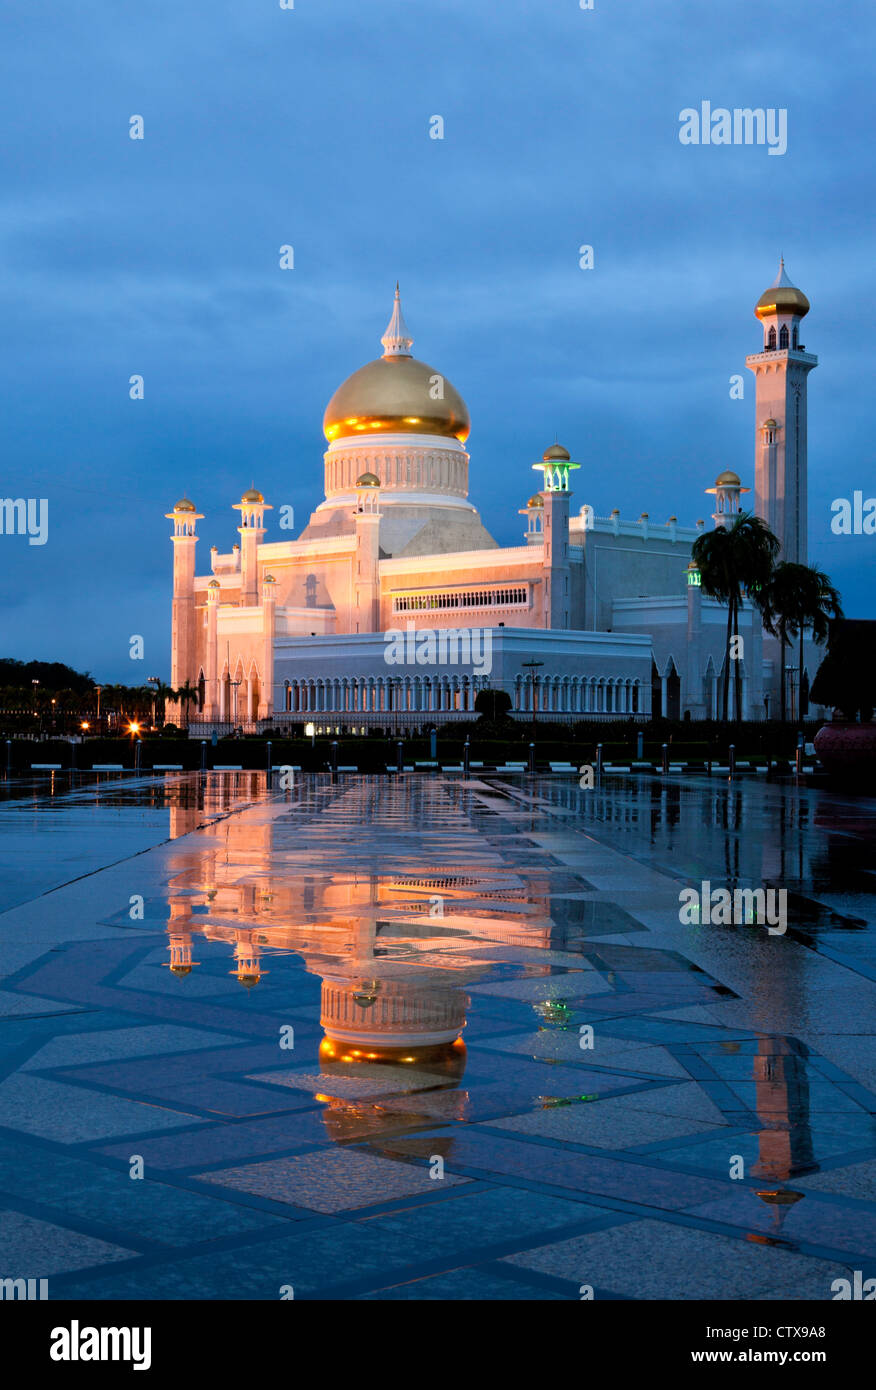 Omar Ali Saifuddien Mosque at dawn  Bandar Seri Begawan Brunei. - Stock Image